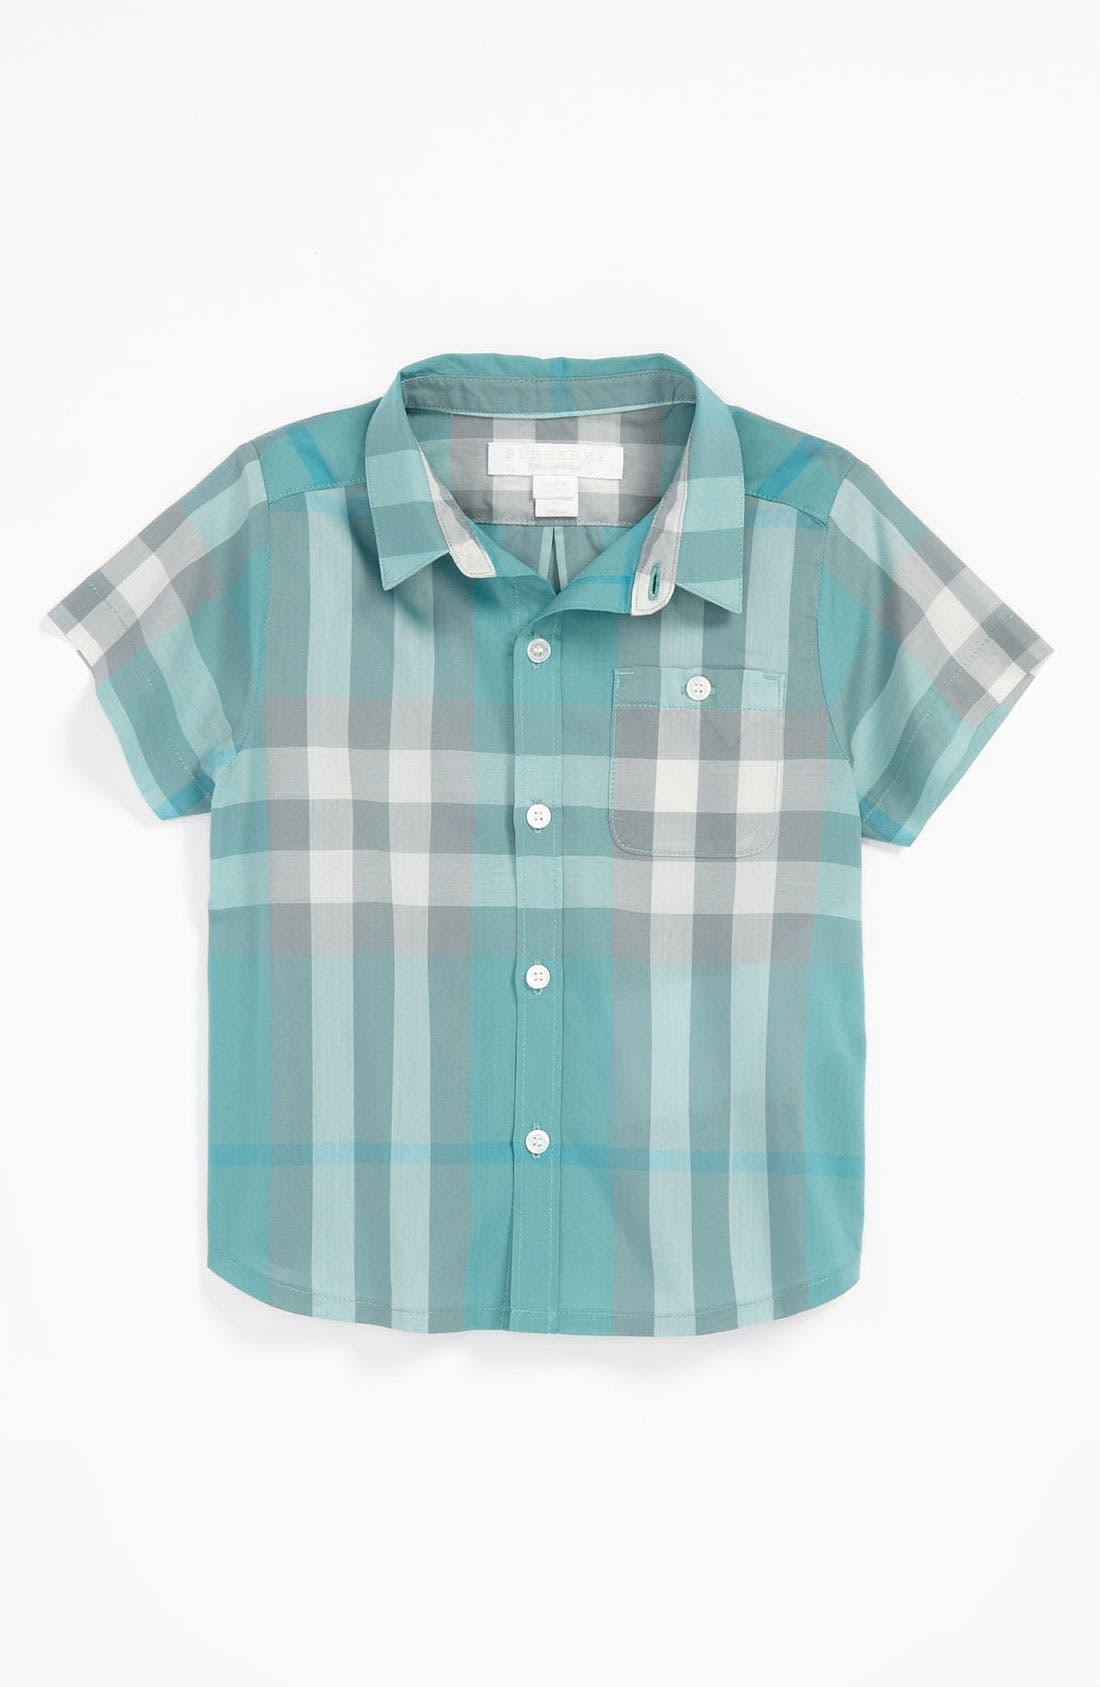 Alternate Image 1 Selected - Burberry 'Tyson' Shirt (Baby)